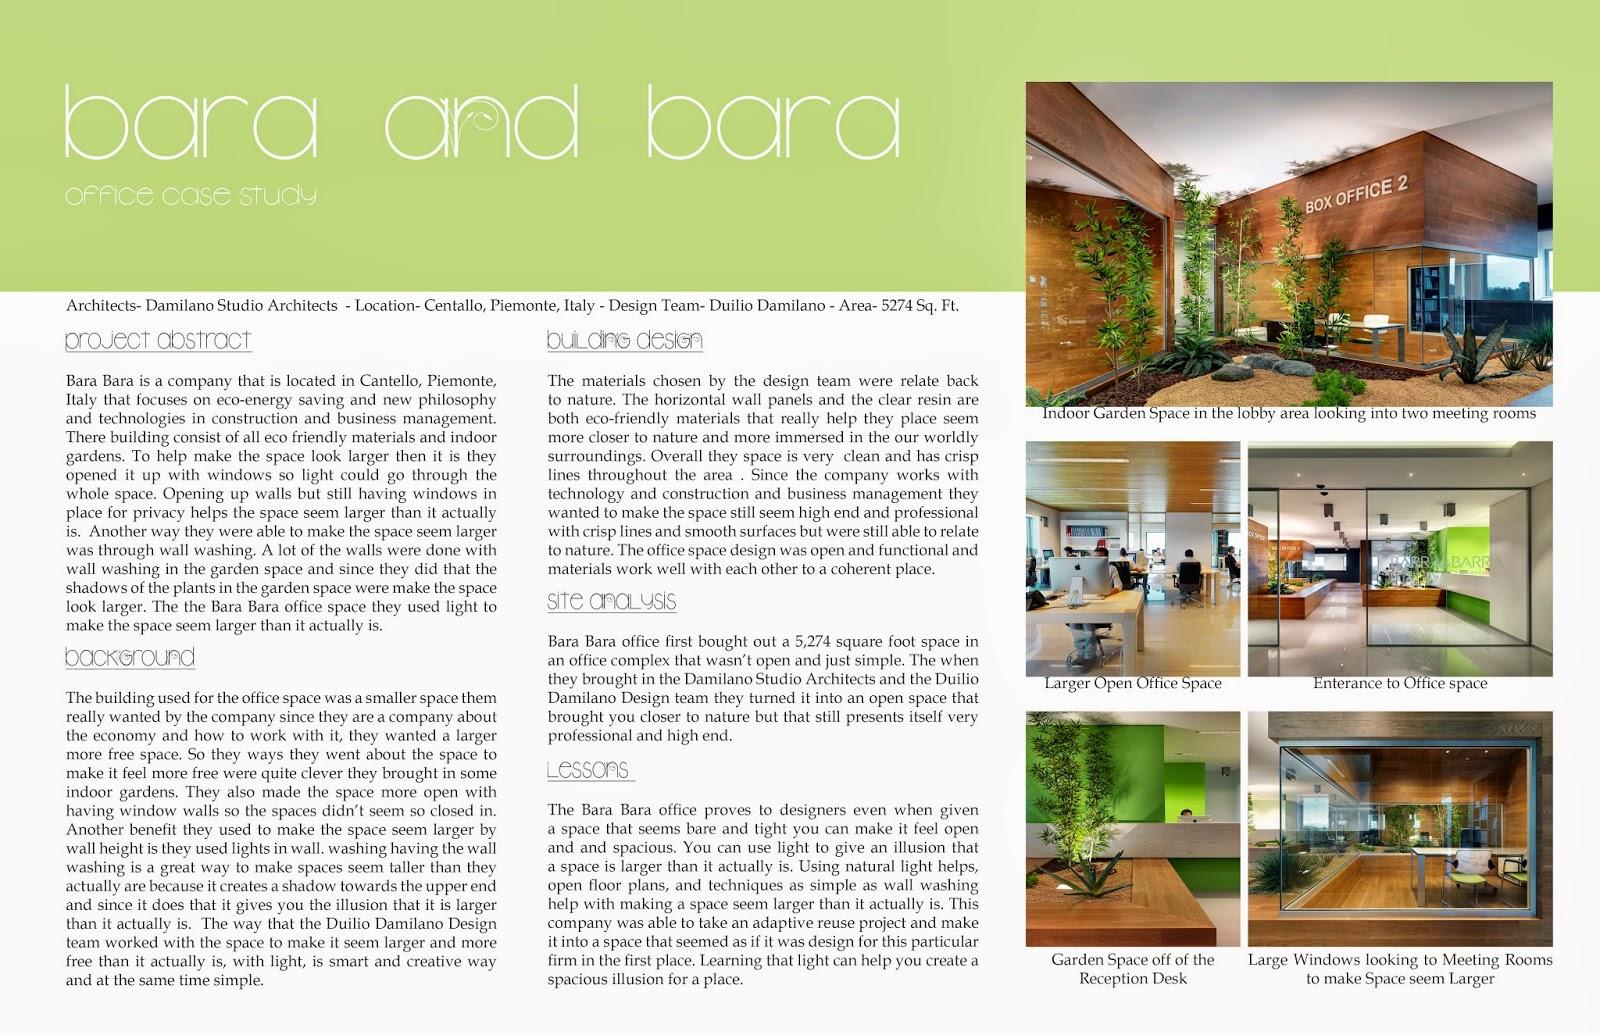 Michelle Hanna Interior Design Portfolio: Office Space